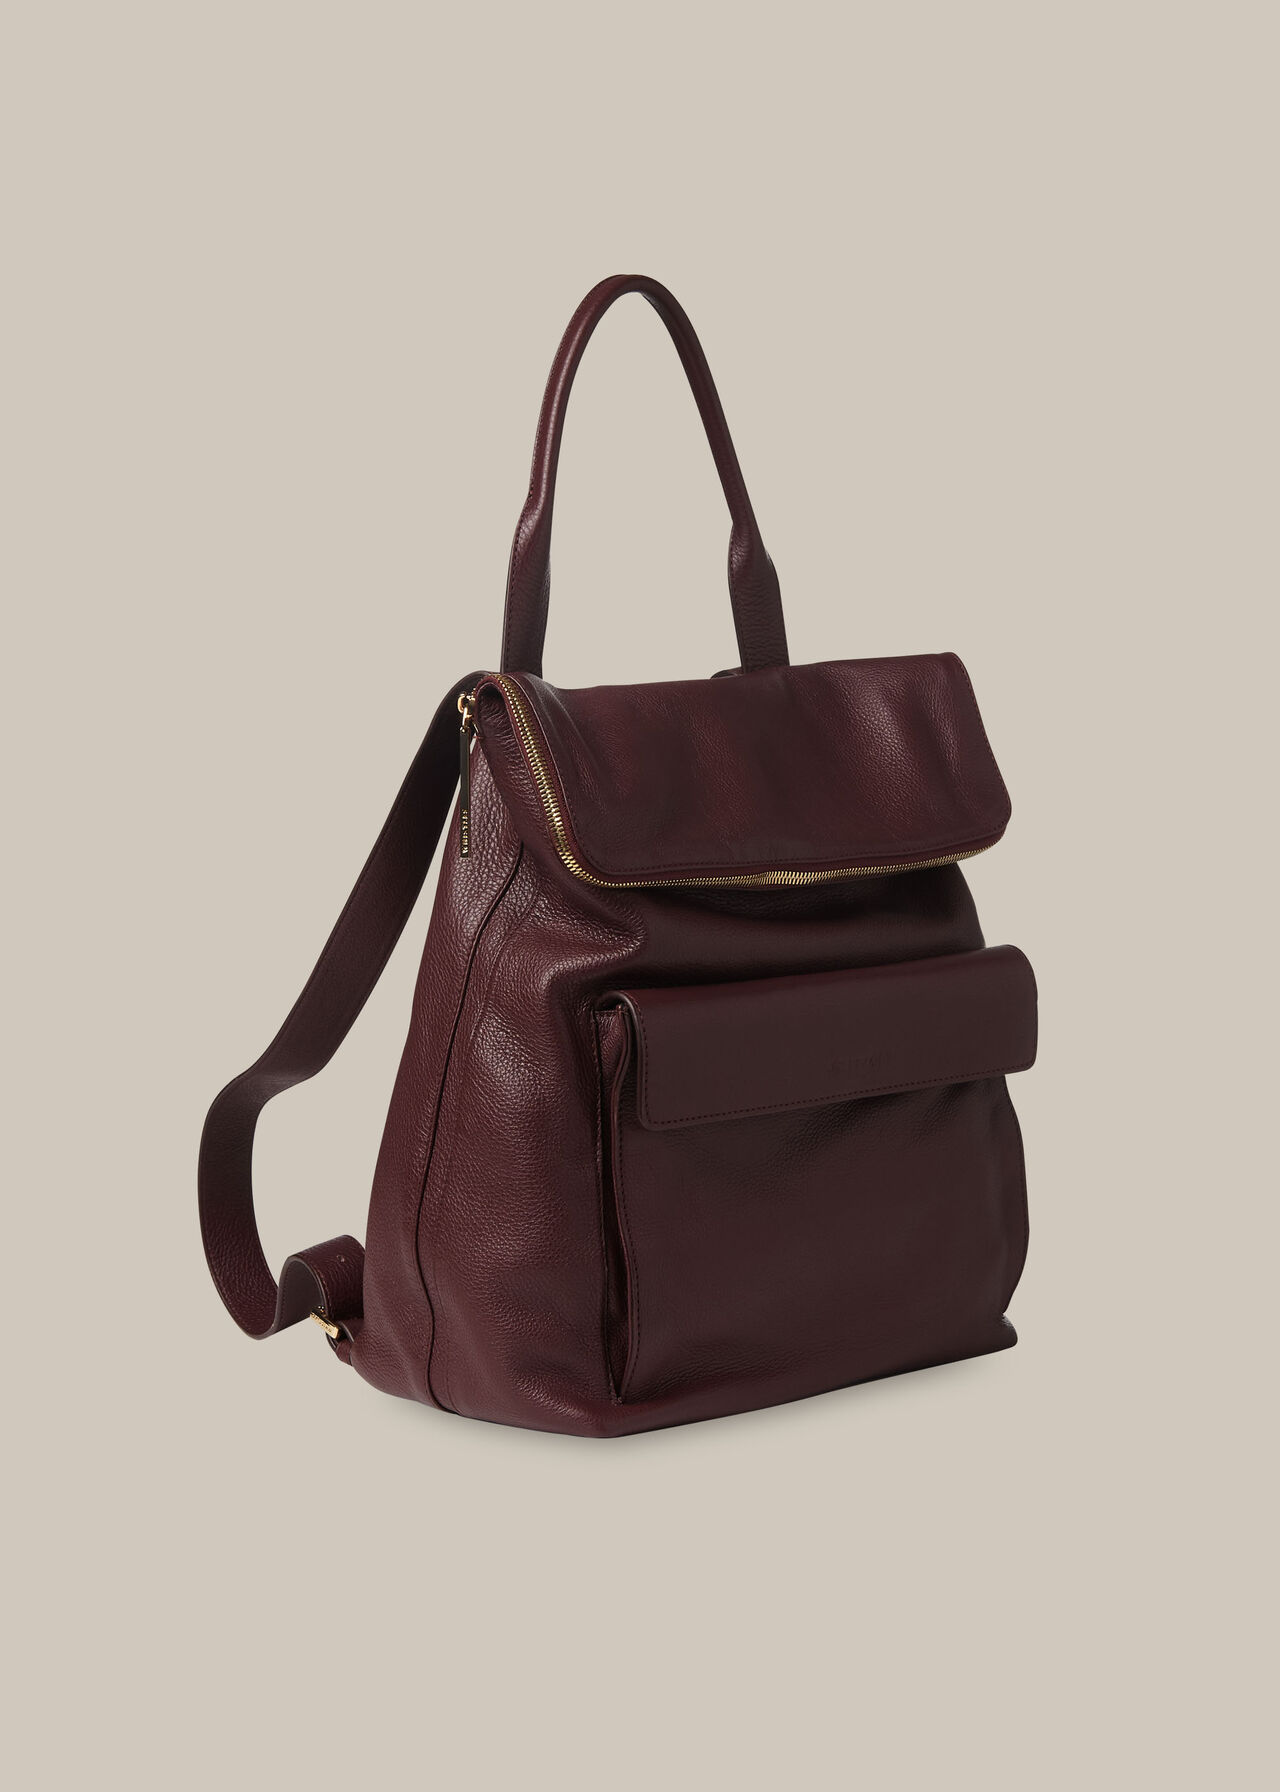 Verity Backpack